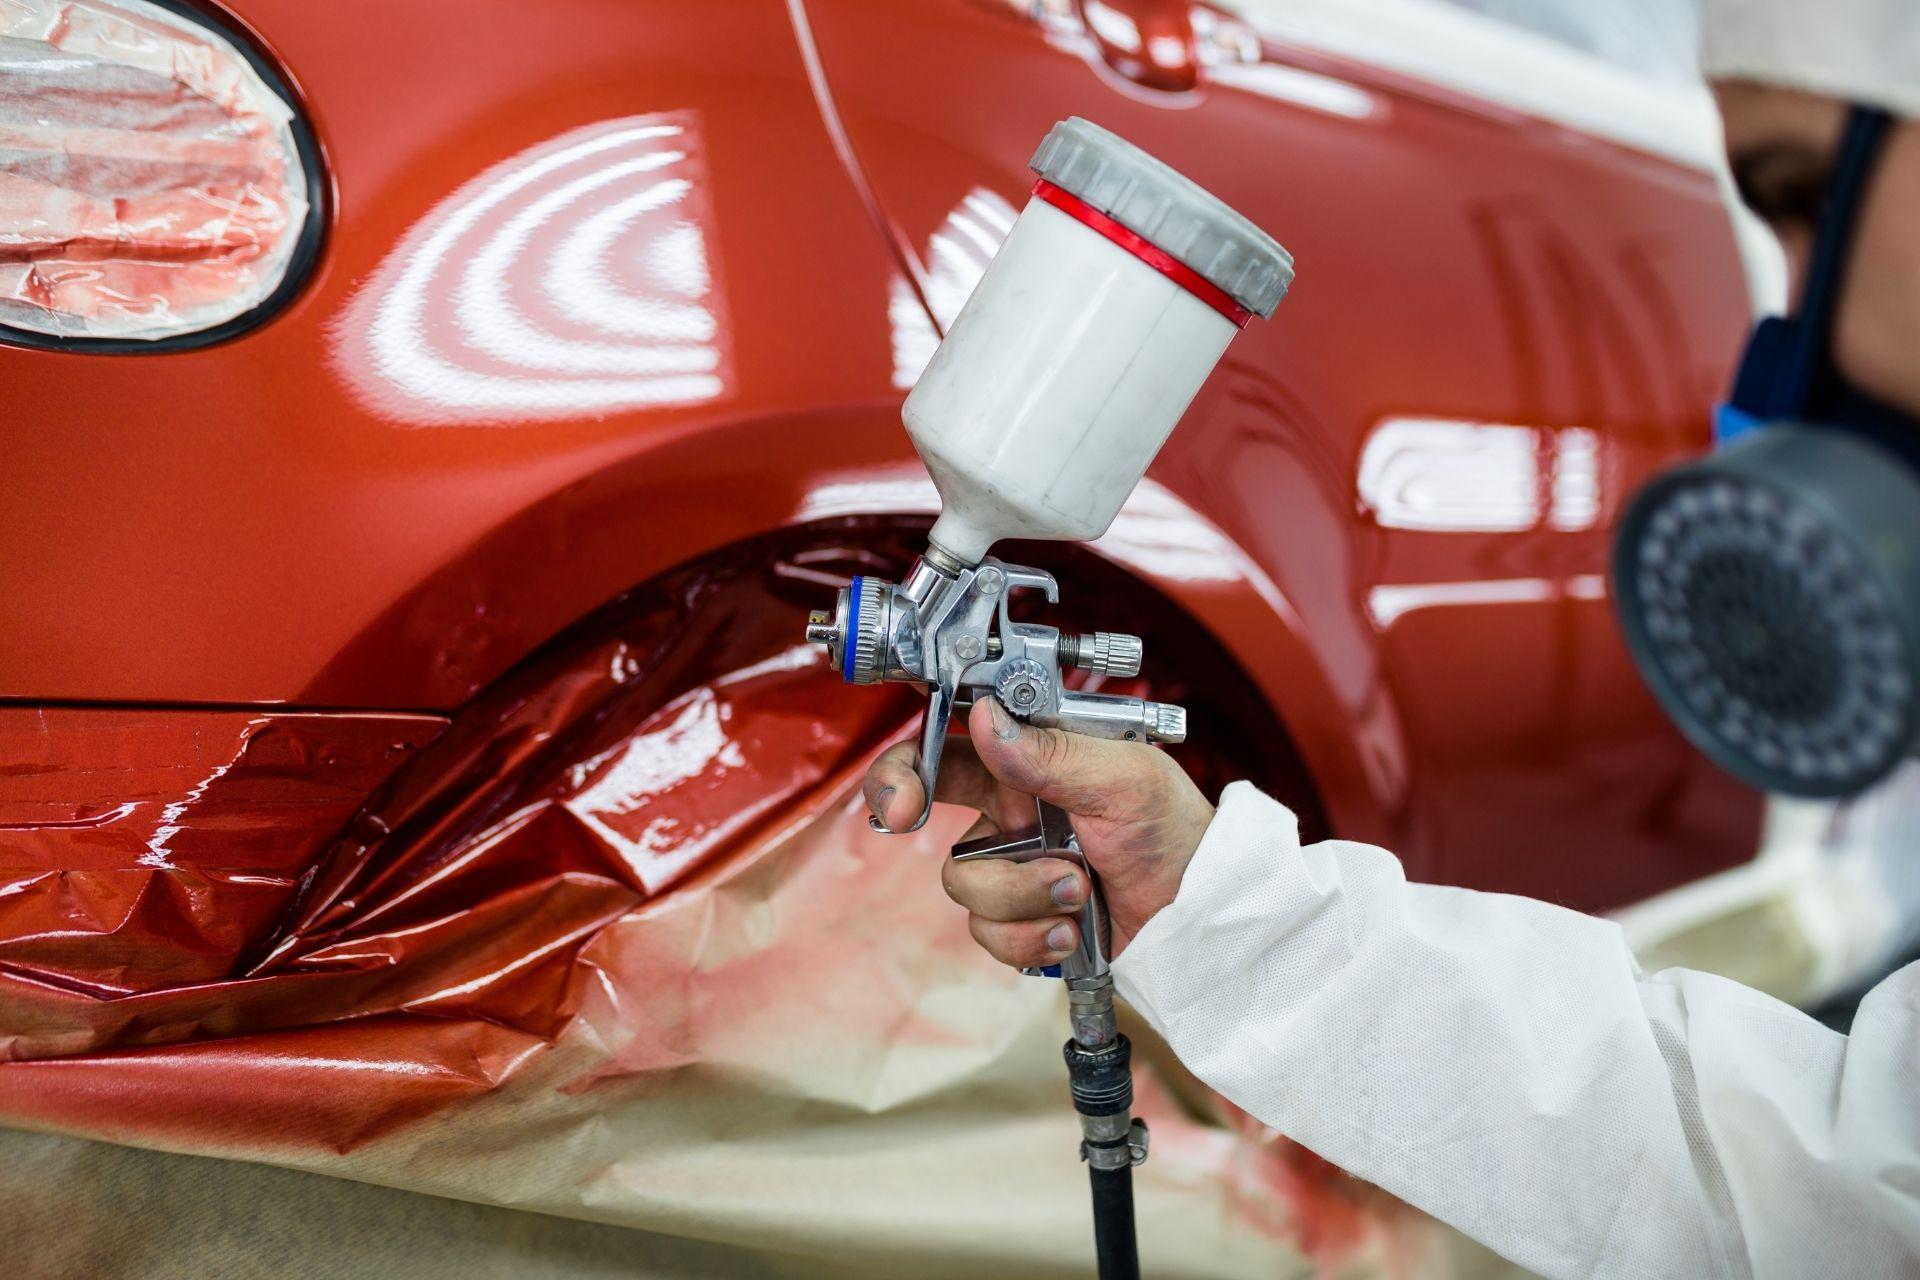 guy spraying car in red